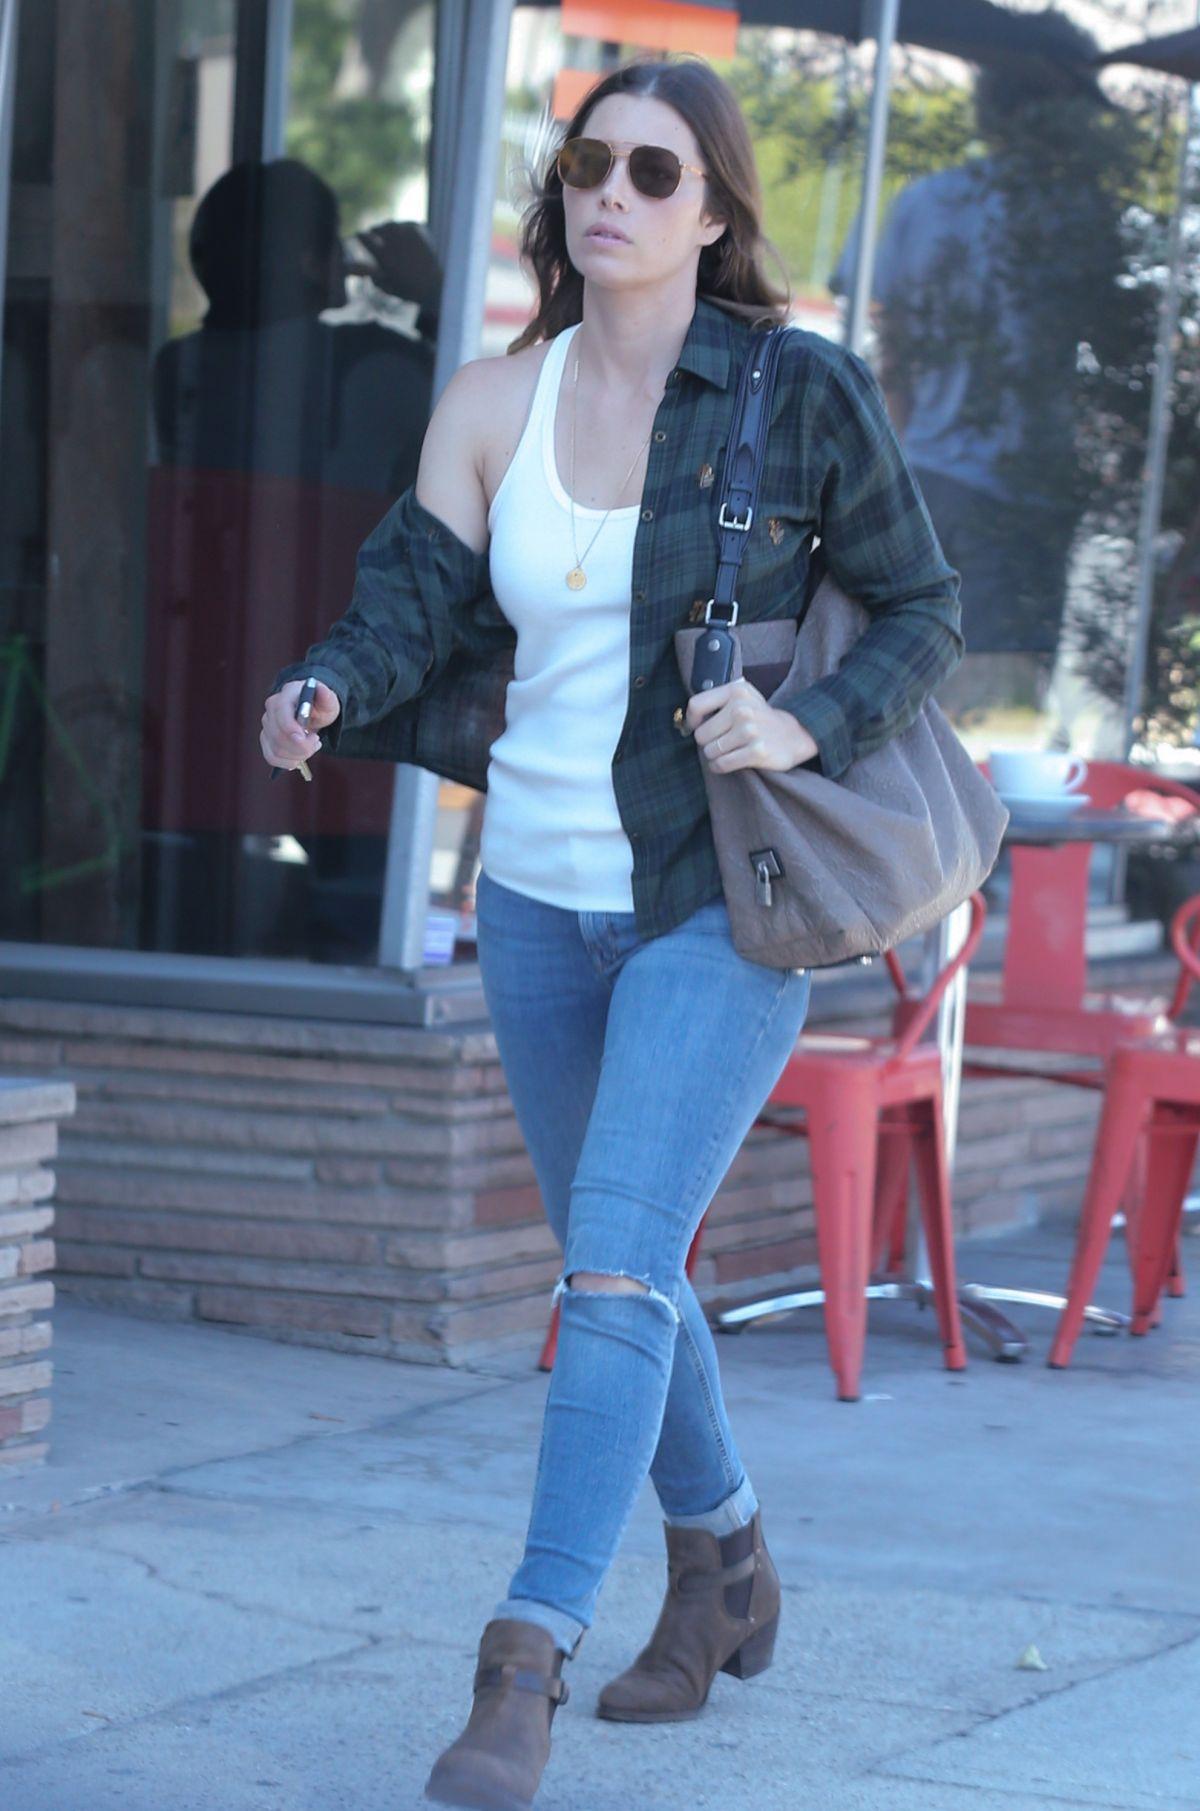 JESSICA BIEL in Jeans Out in Santa Monica 07/15/2016